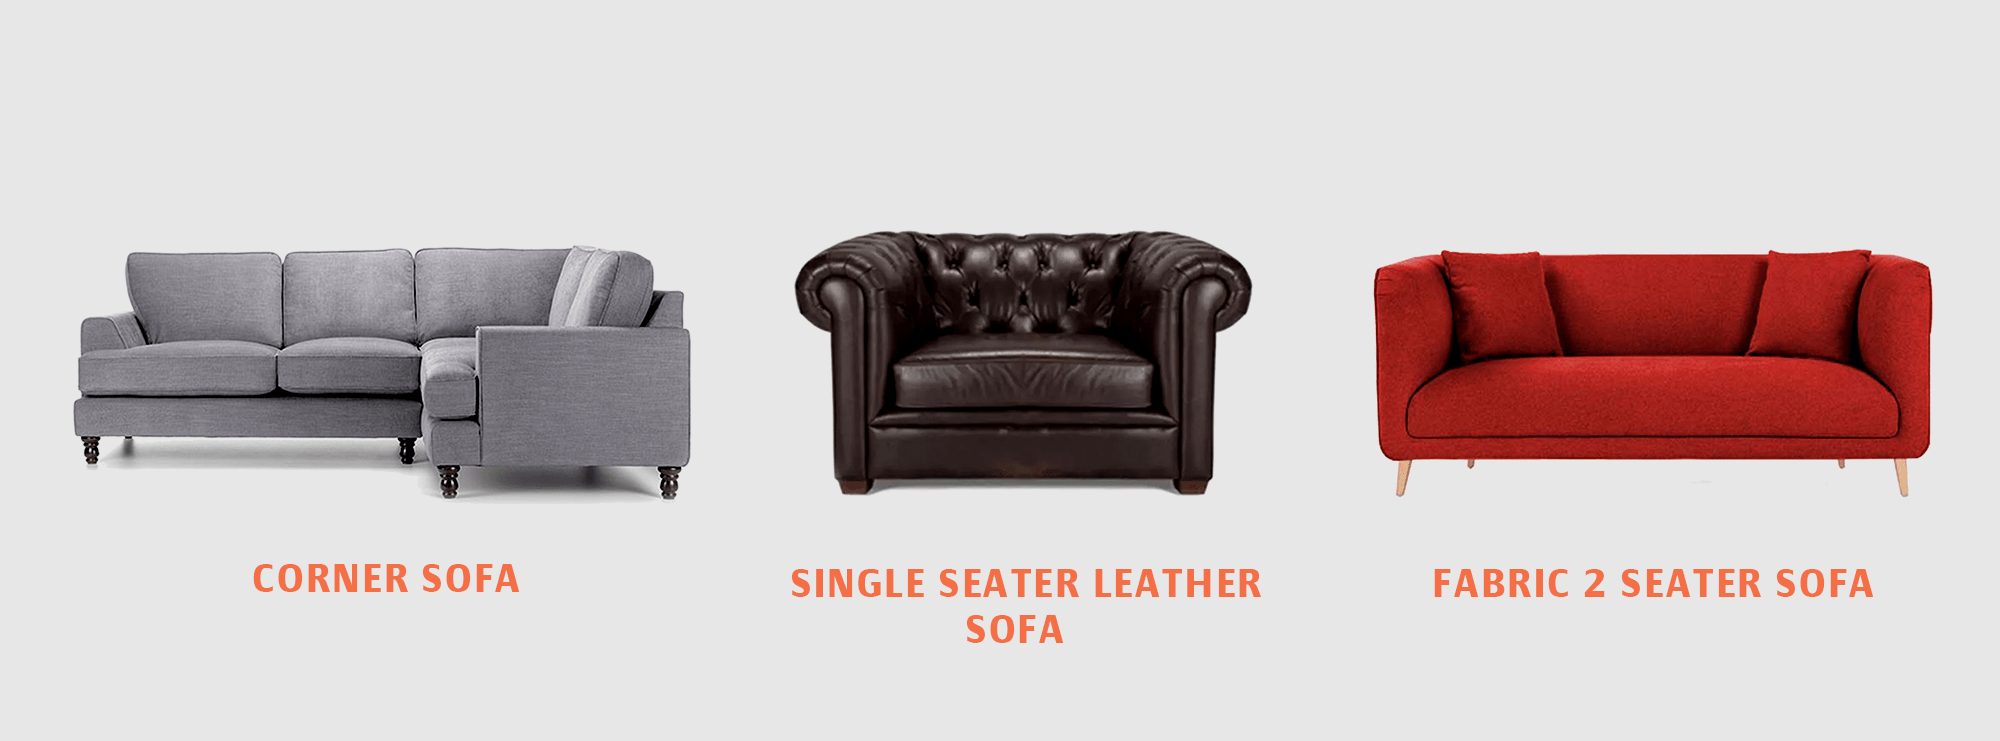 Single-seater-leather-Sofa-Chennai